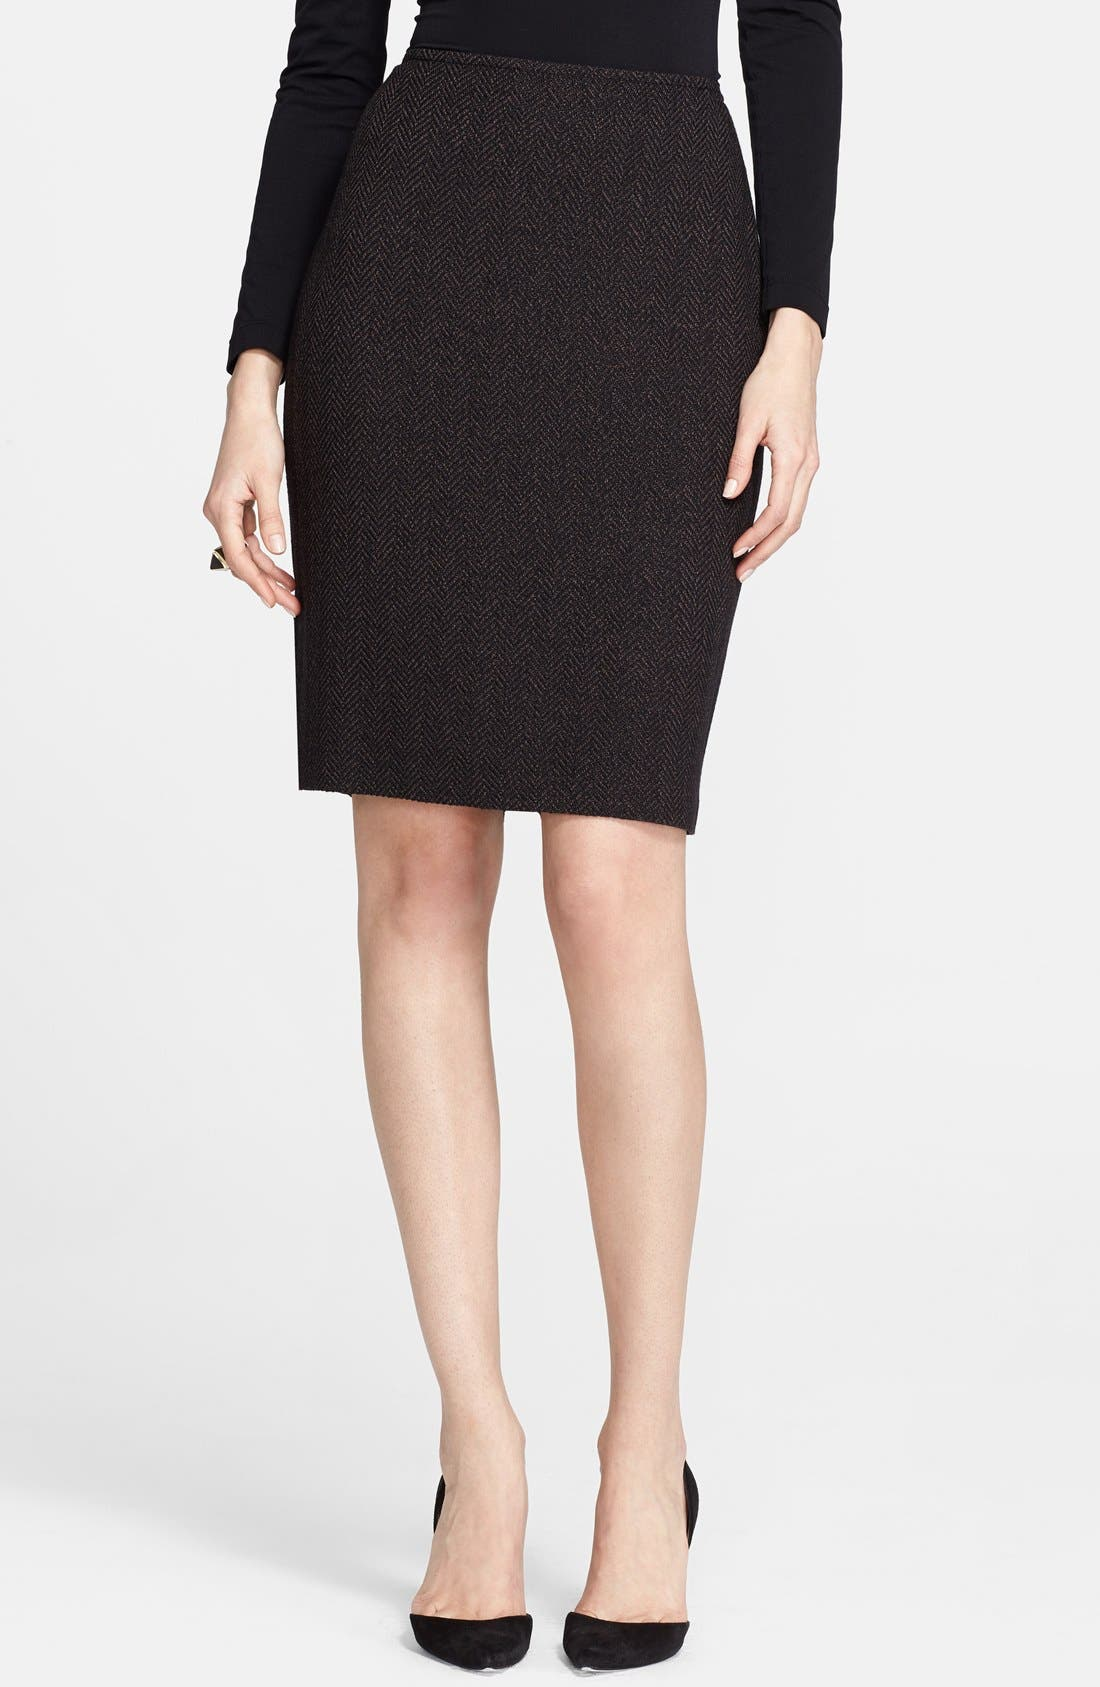 Alternate Image 1 Selected - St. John Collection Bouclé Herringbone Knit Skirt